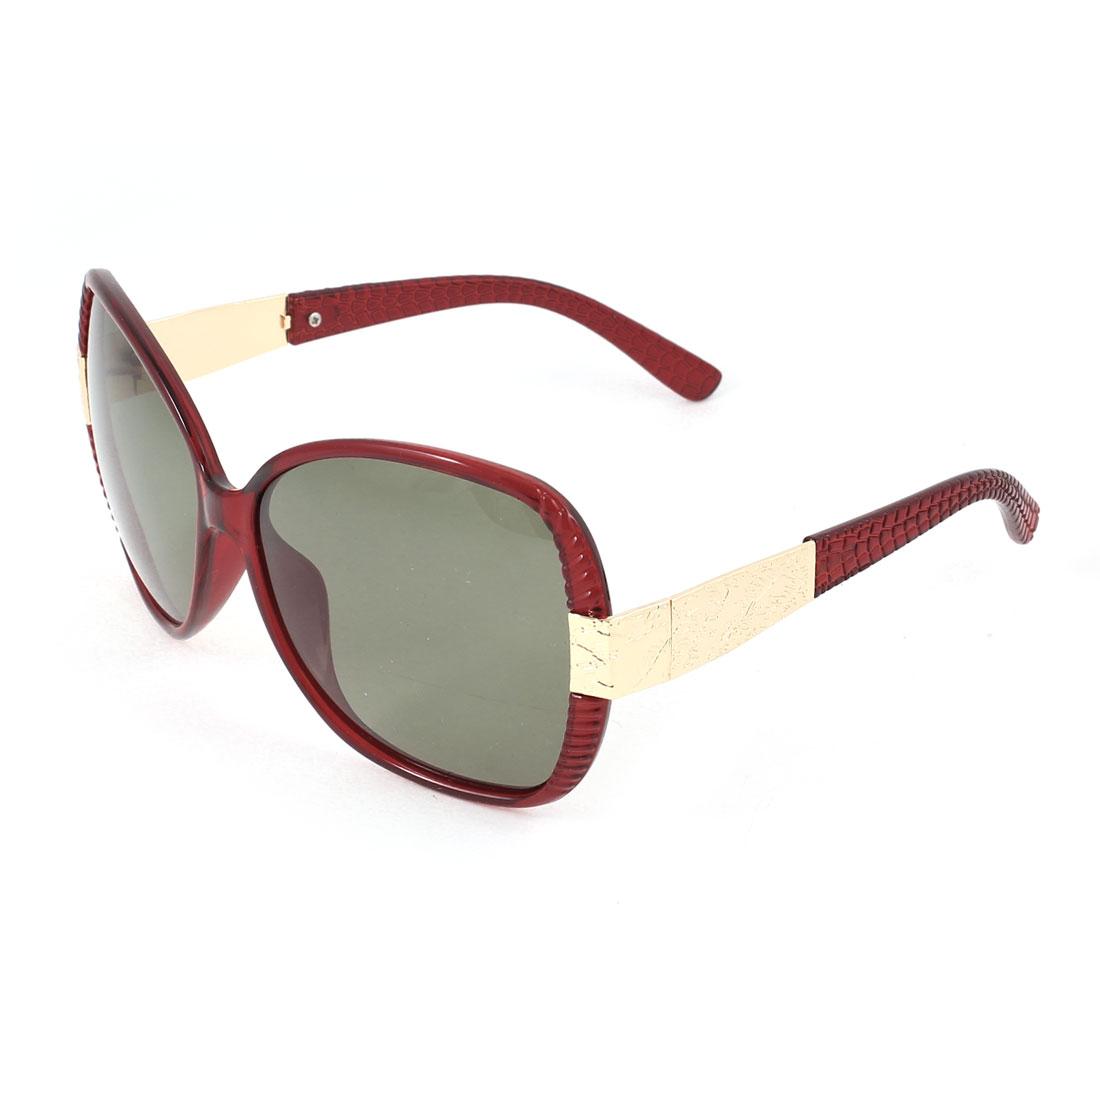 Single Bridge Red Plastic Full Rim Frame Gray Green Lens Gold Tone Metal Decor Temple Beach Leisure Polarized Glasses Sunglasses for Woman